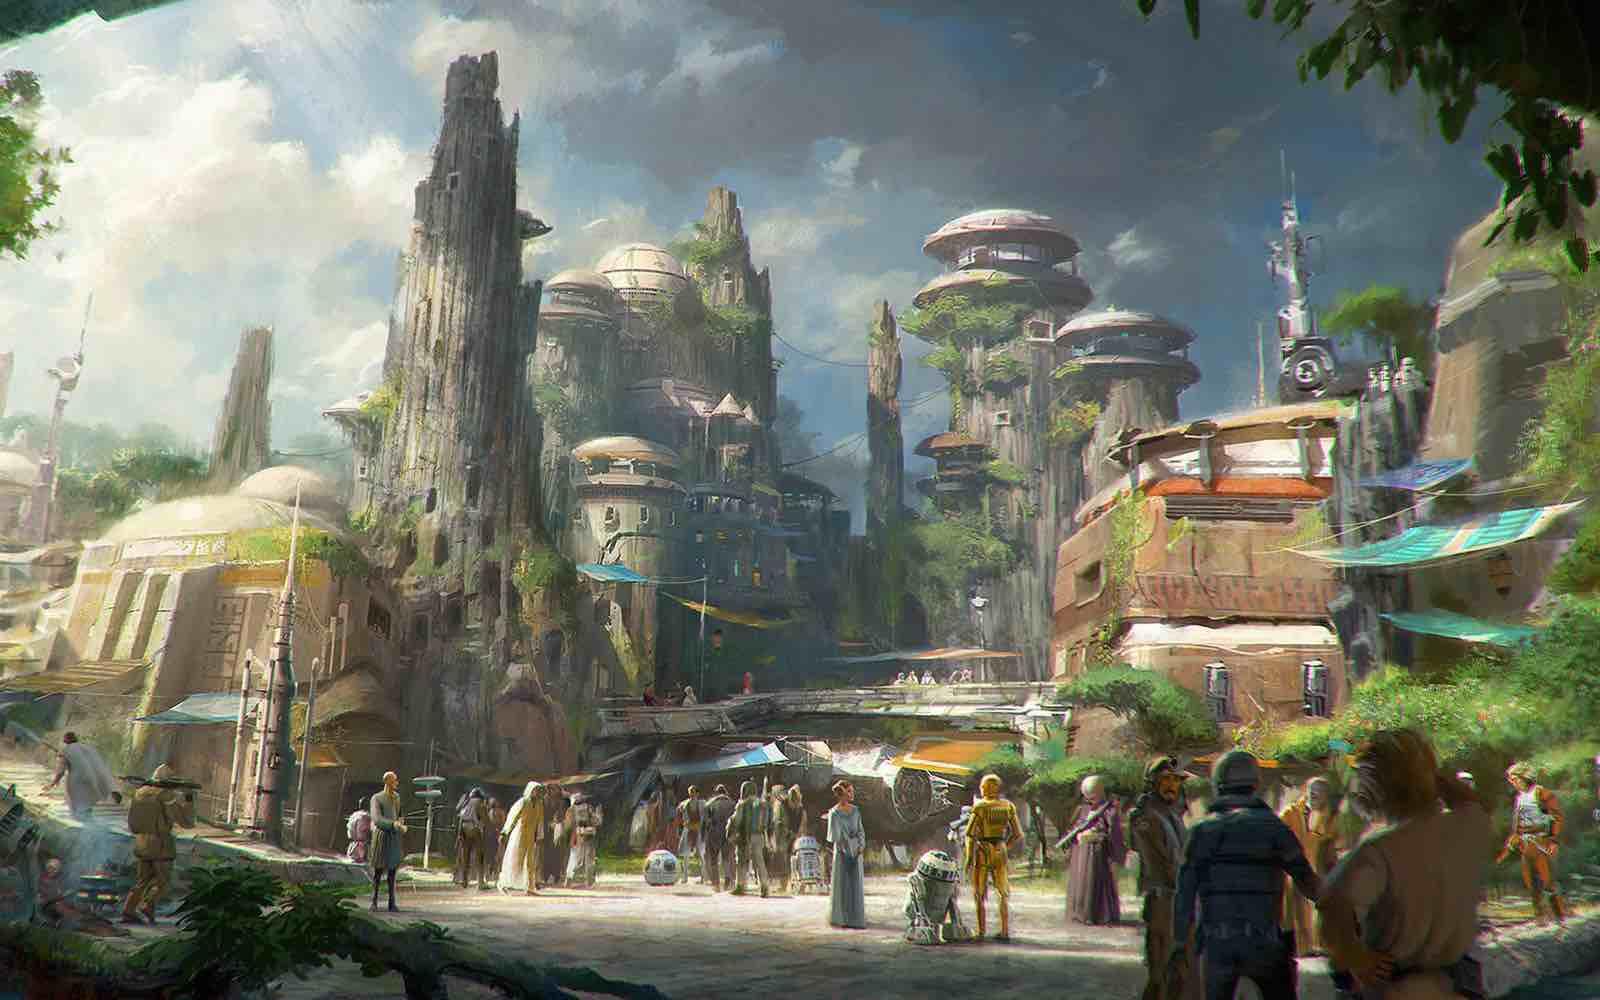 Star Wars-Themed Land Concept artiste